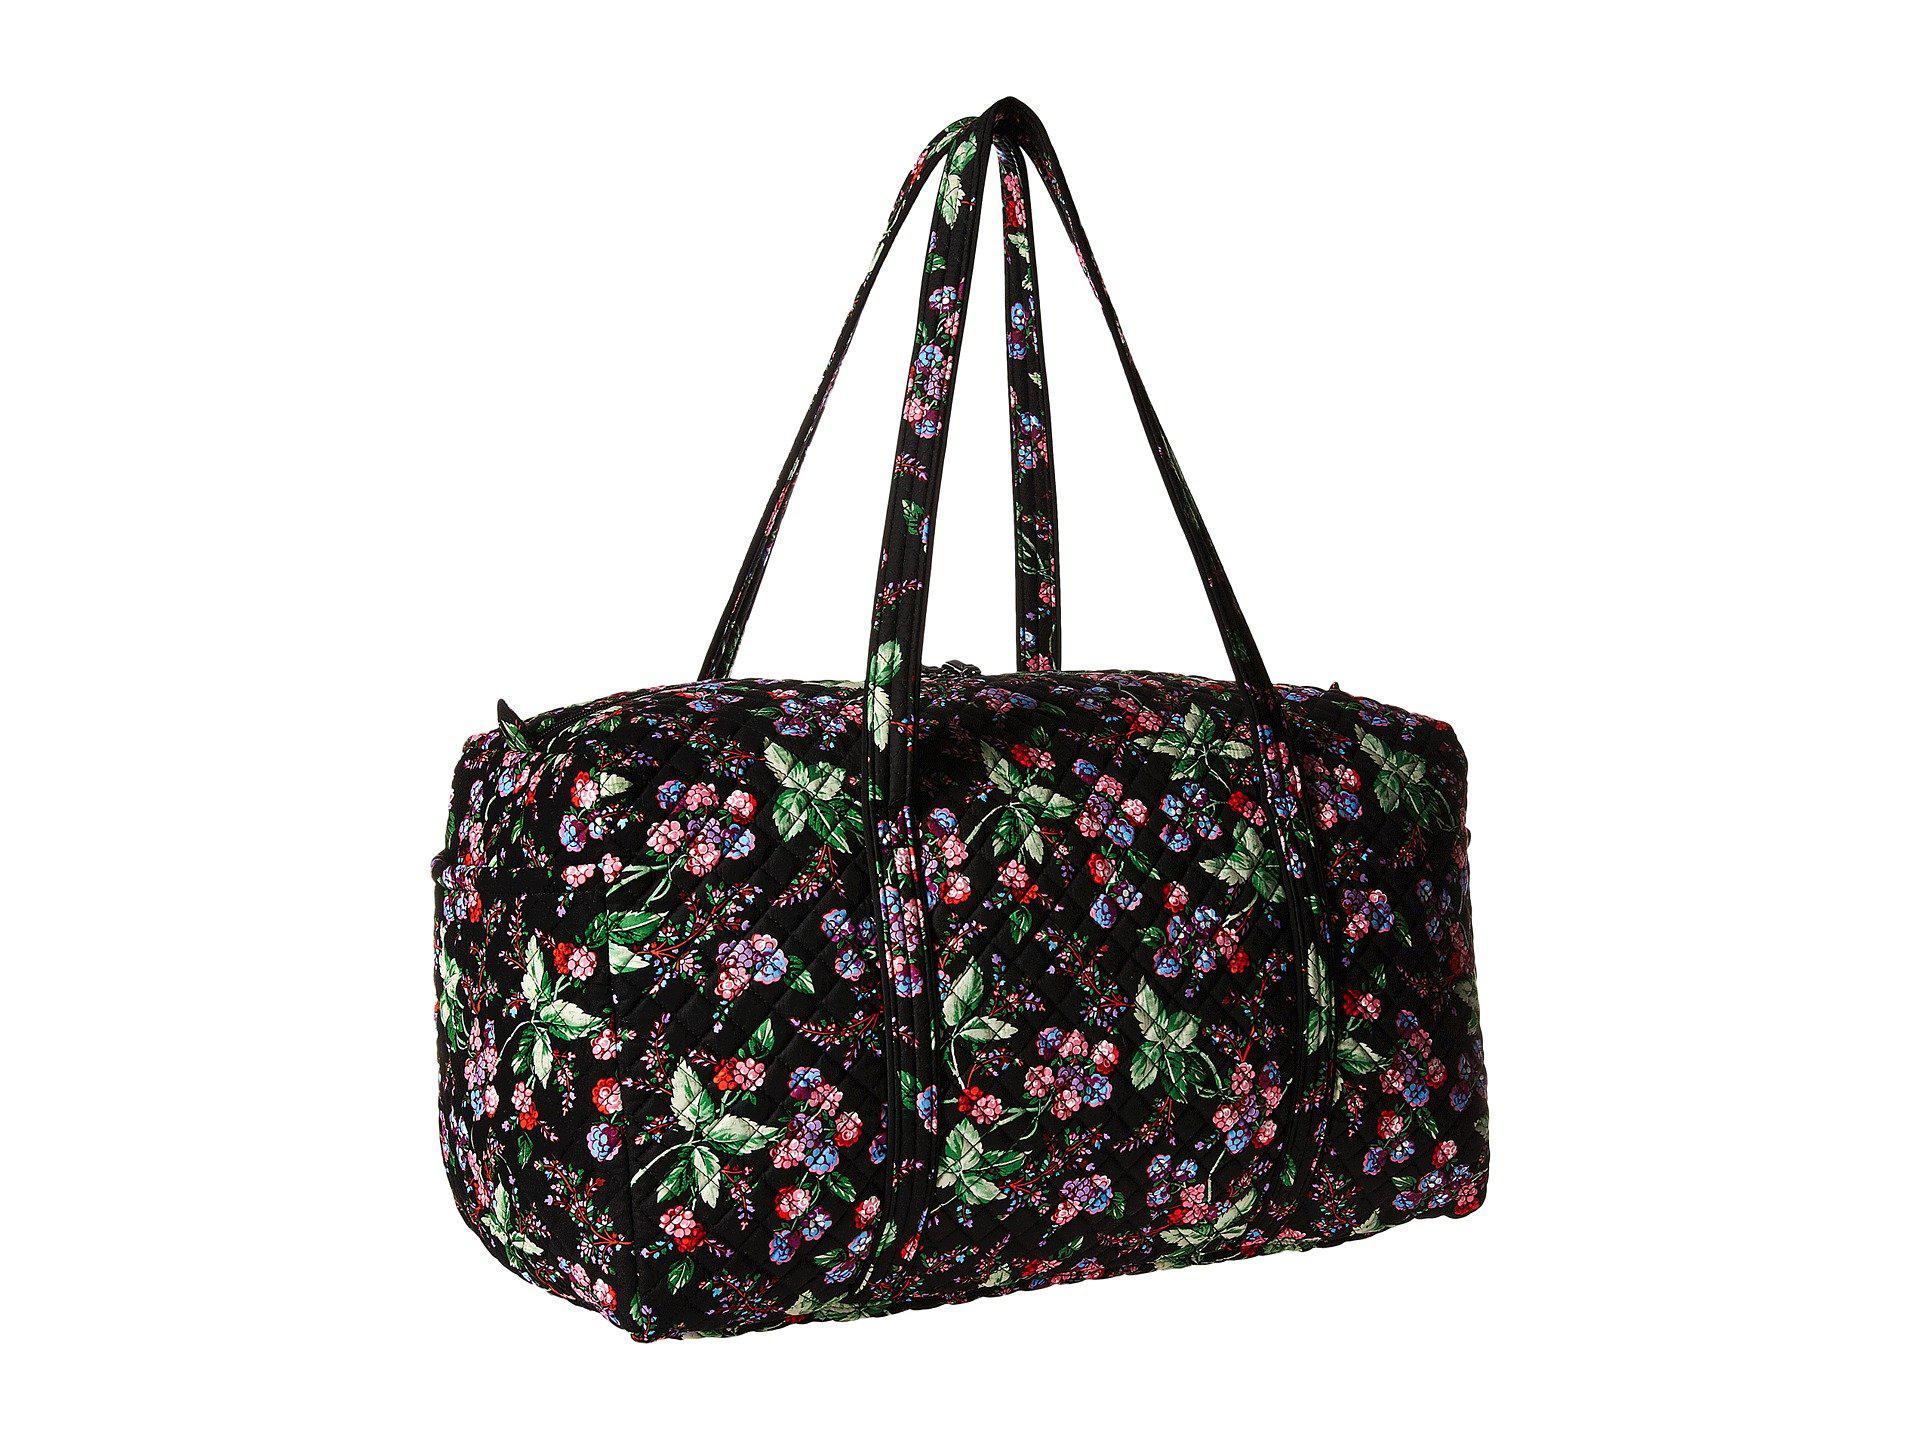 Vera Bradley - Iconic Large Travel Duffel (classic Black) Duffel Bags -  Lyst. View fullscreen 2b971dfd7a80a